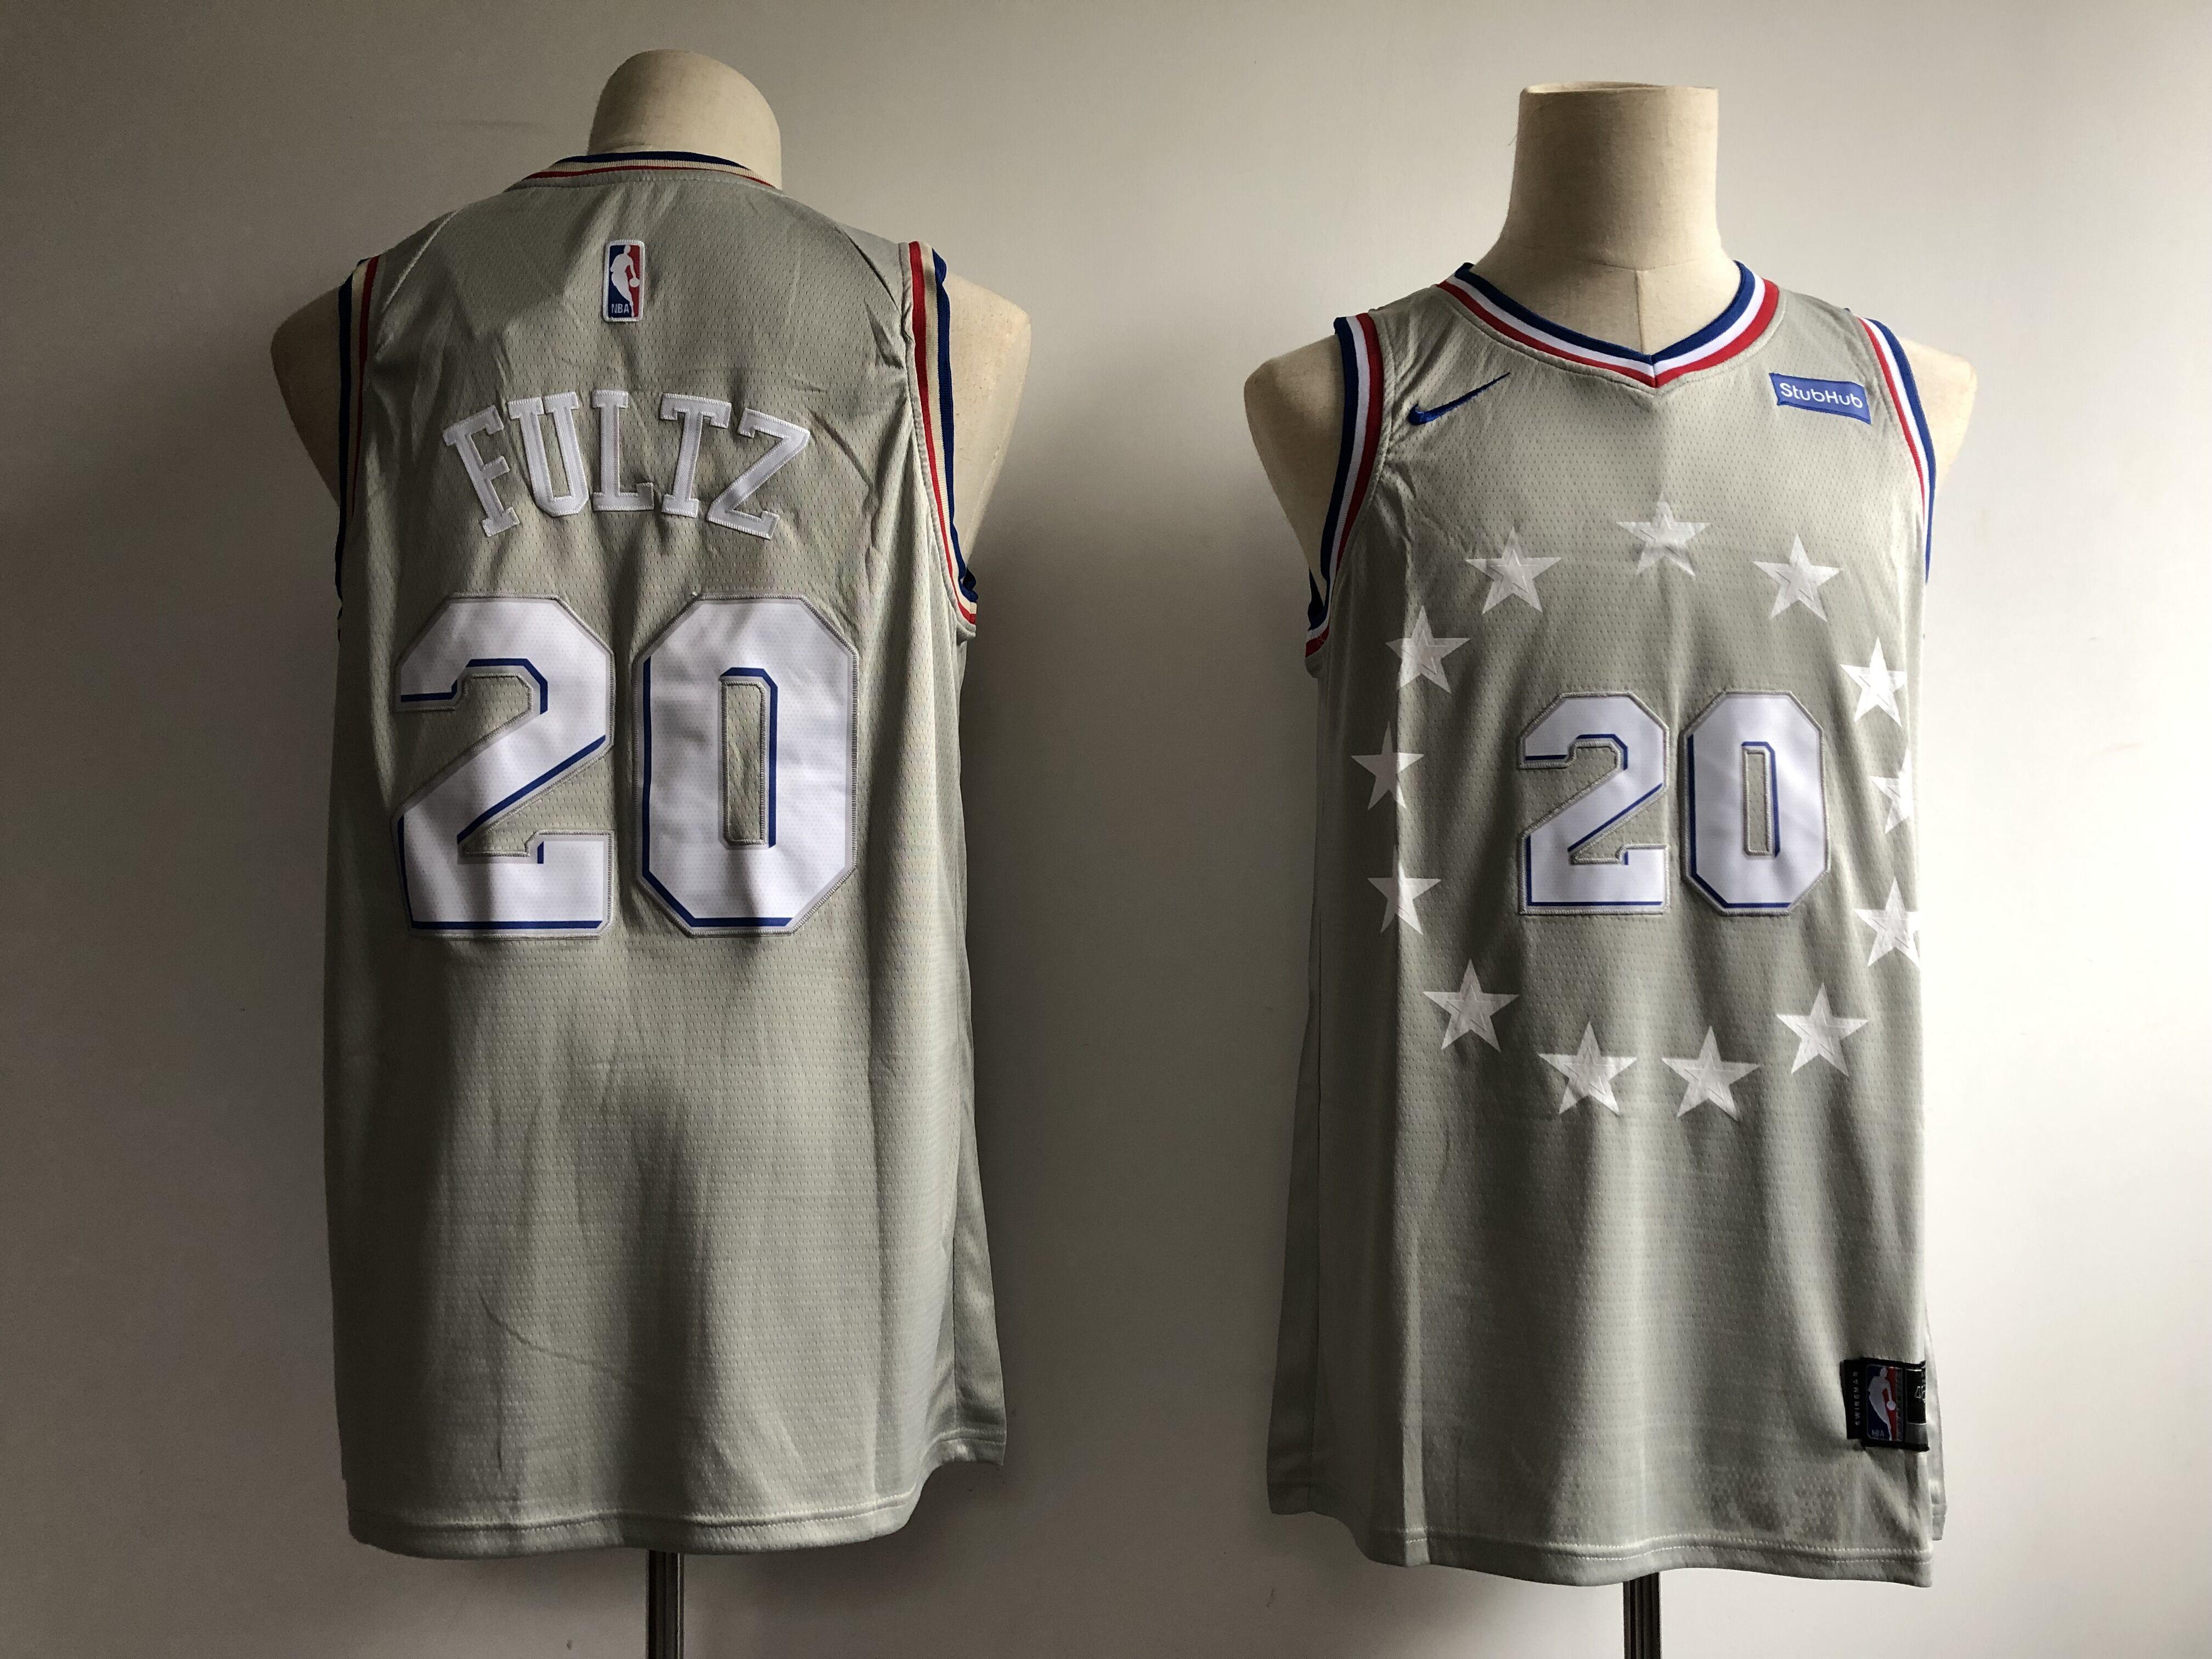 76ers 20 Markelle FultzGray 2018-19 City Edition Nike Swingman Jersey